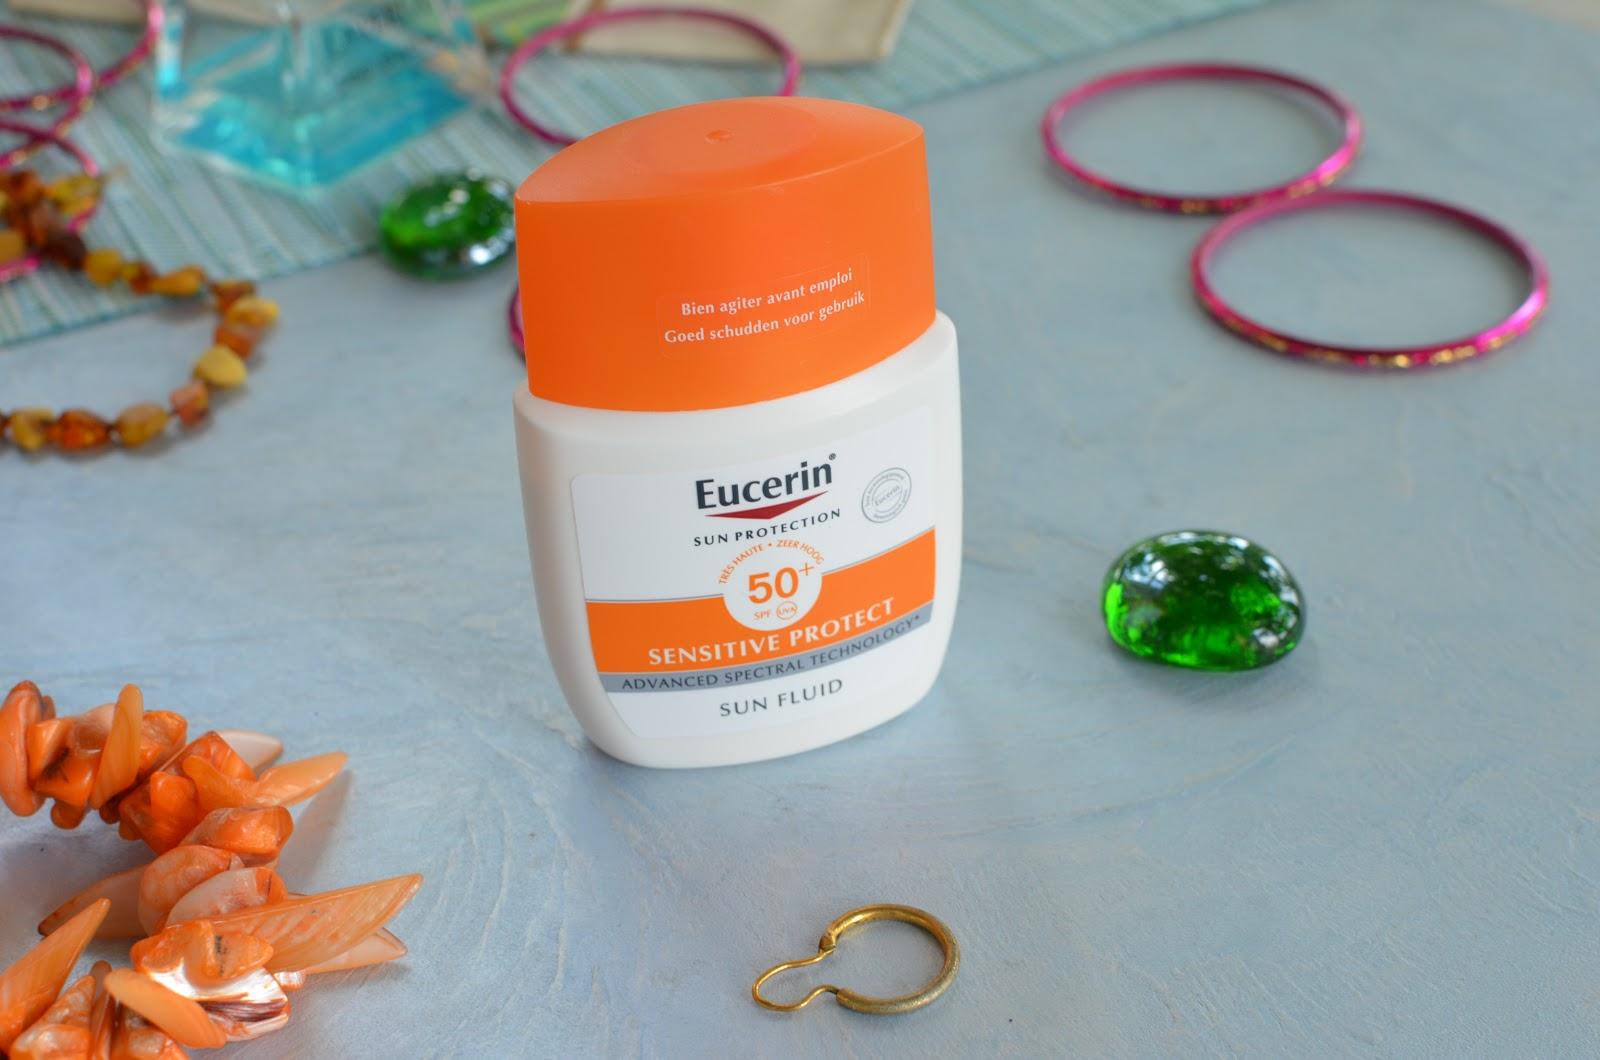 Eucerin Sun Fluid Mattifying SPF 50 Солнцезащитный матирующий флюид для лица с фактором УФ защиты SPF 50